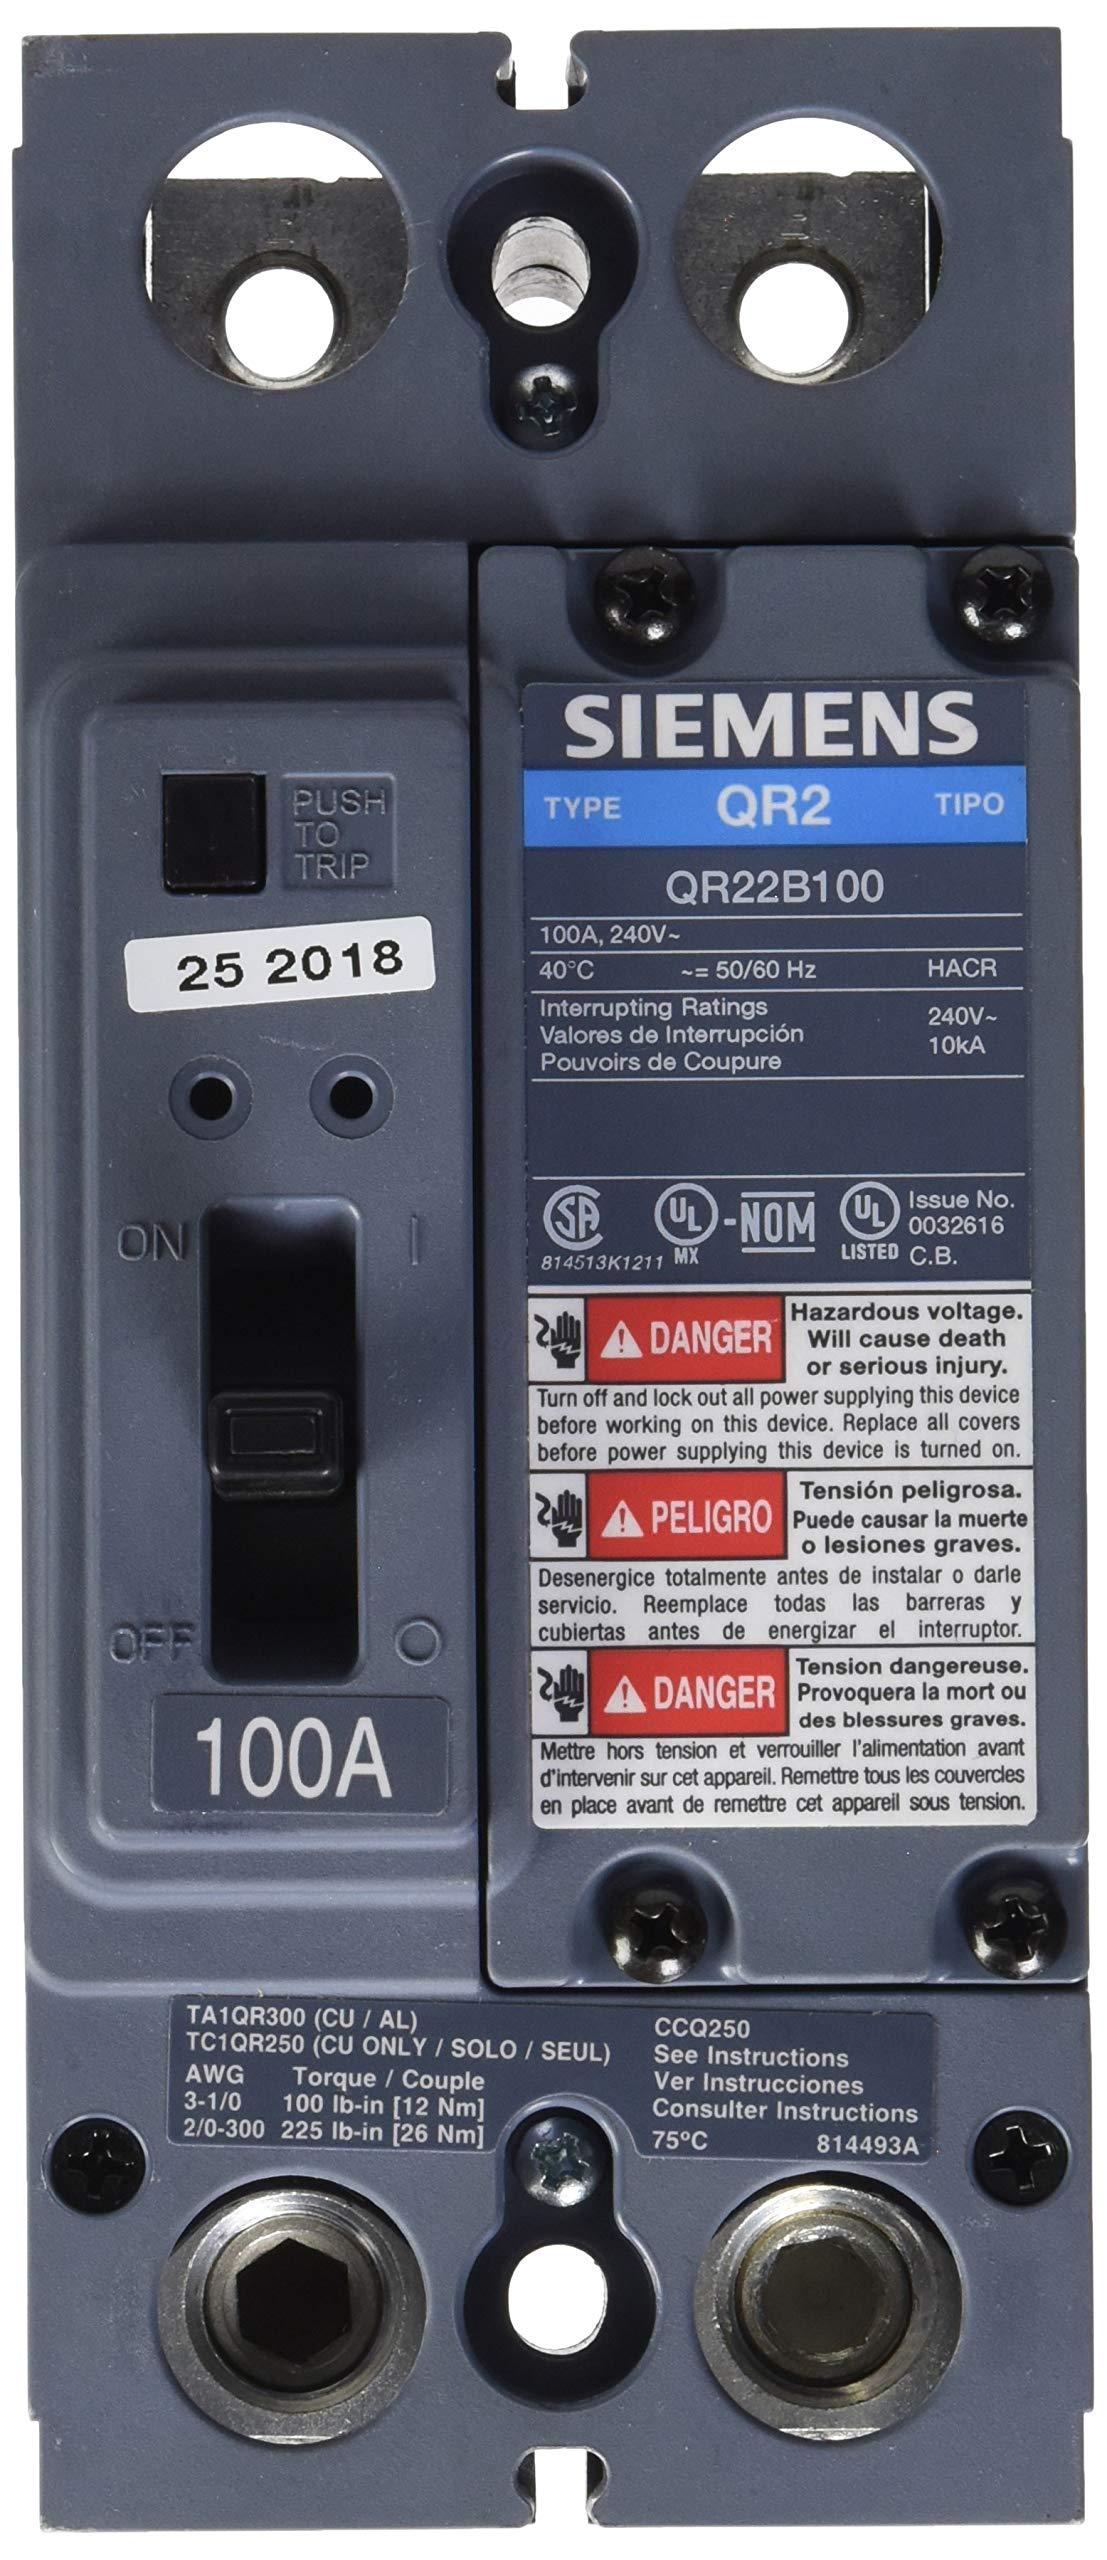 Siemens US2:QR22B100 Molded Case Circuit Breaker Color